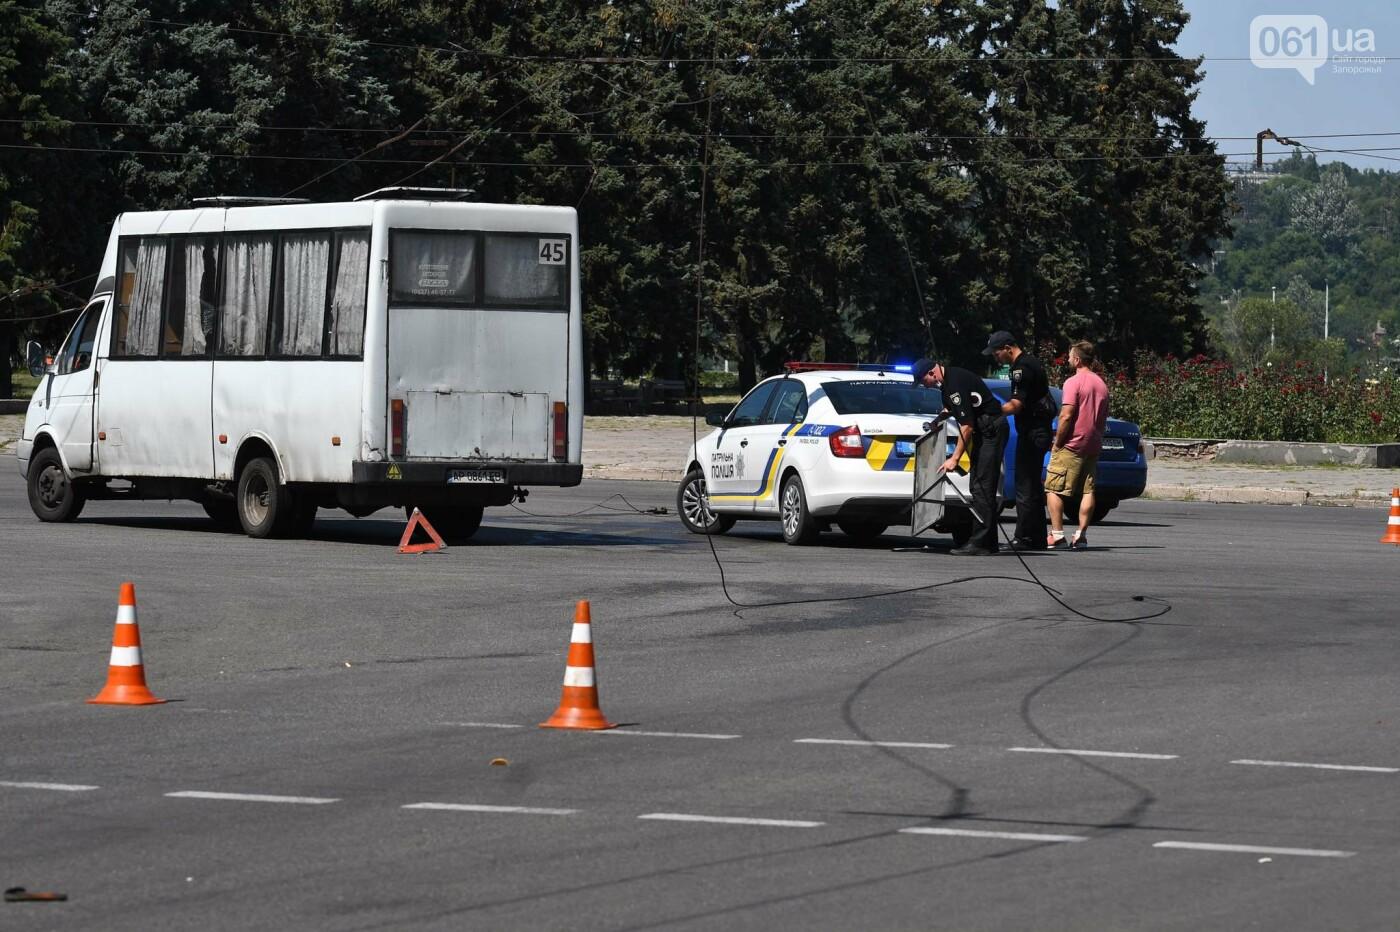 В Запорожье фура оборвала троллеи - провода упали на маршрутку, - ФОТО, фото-5